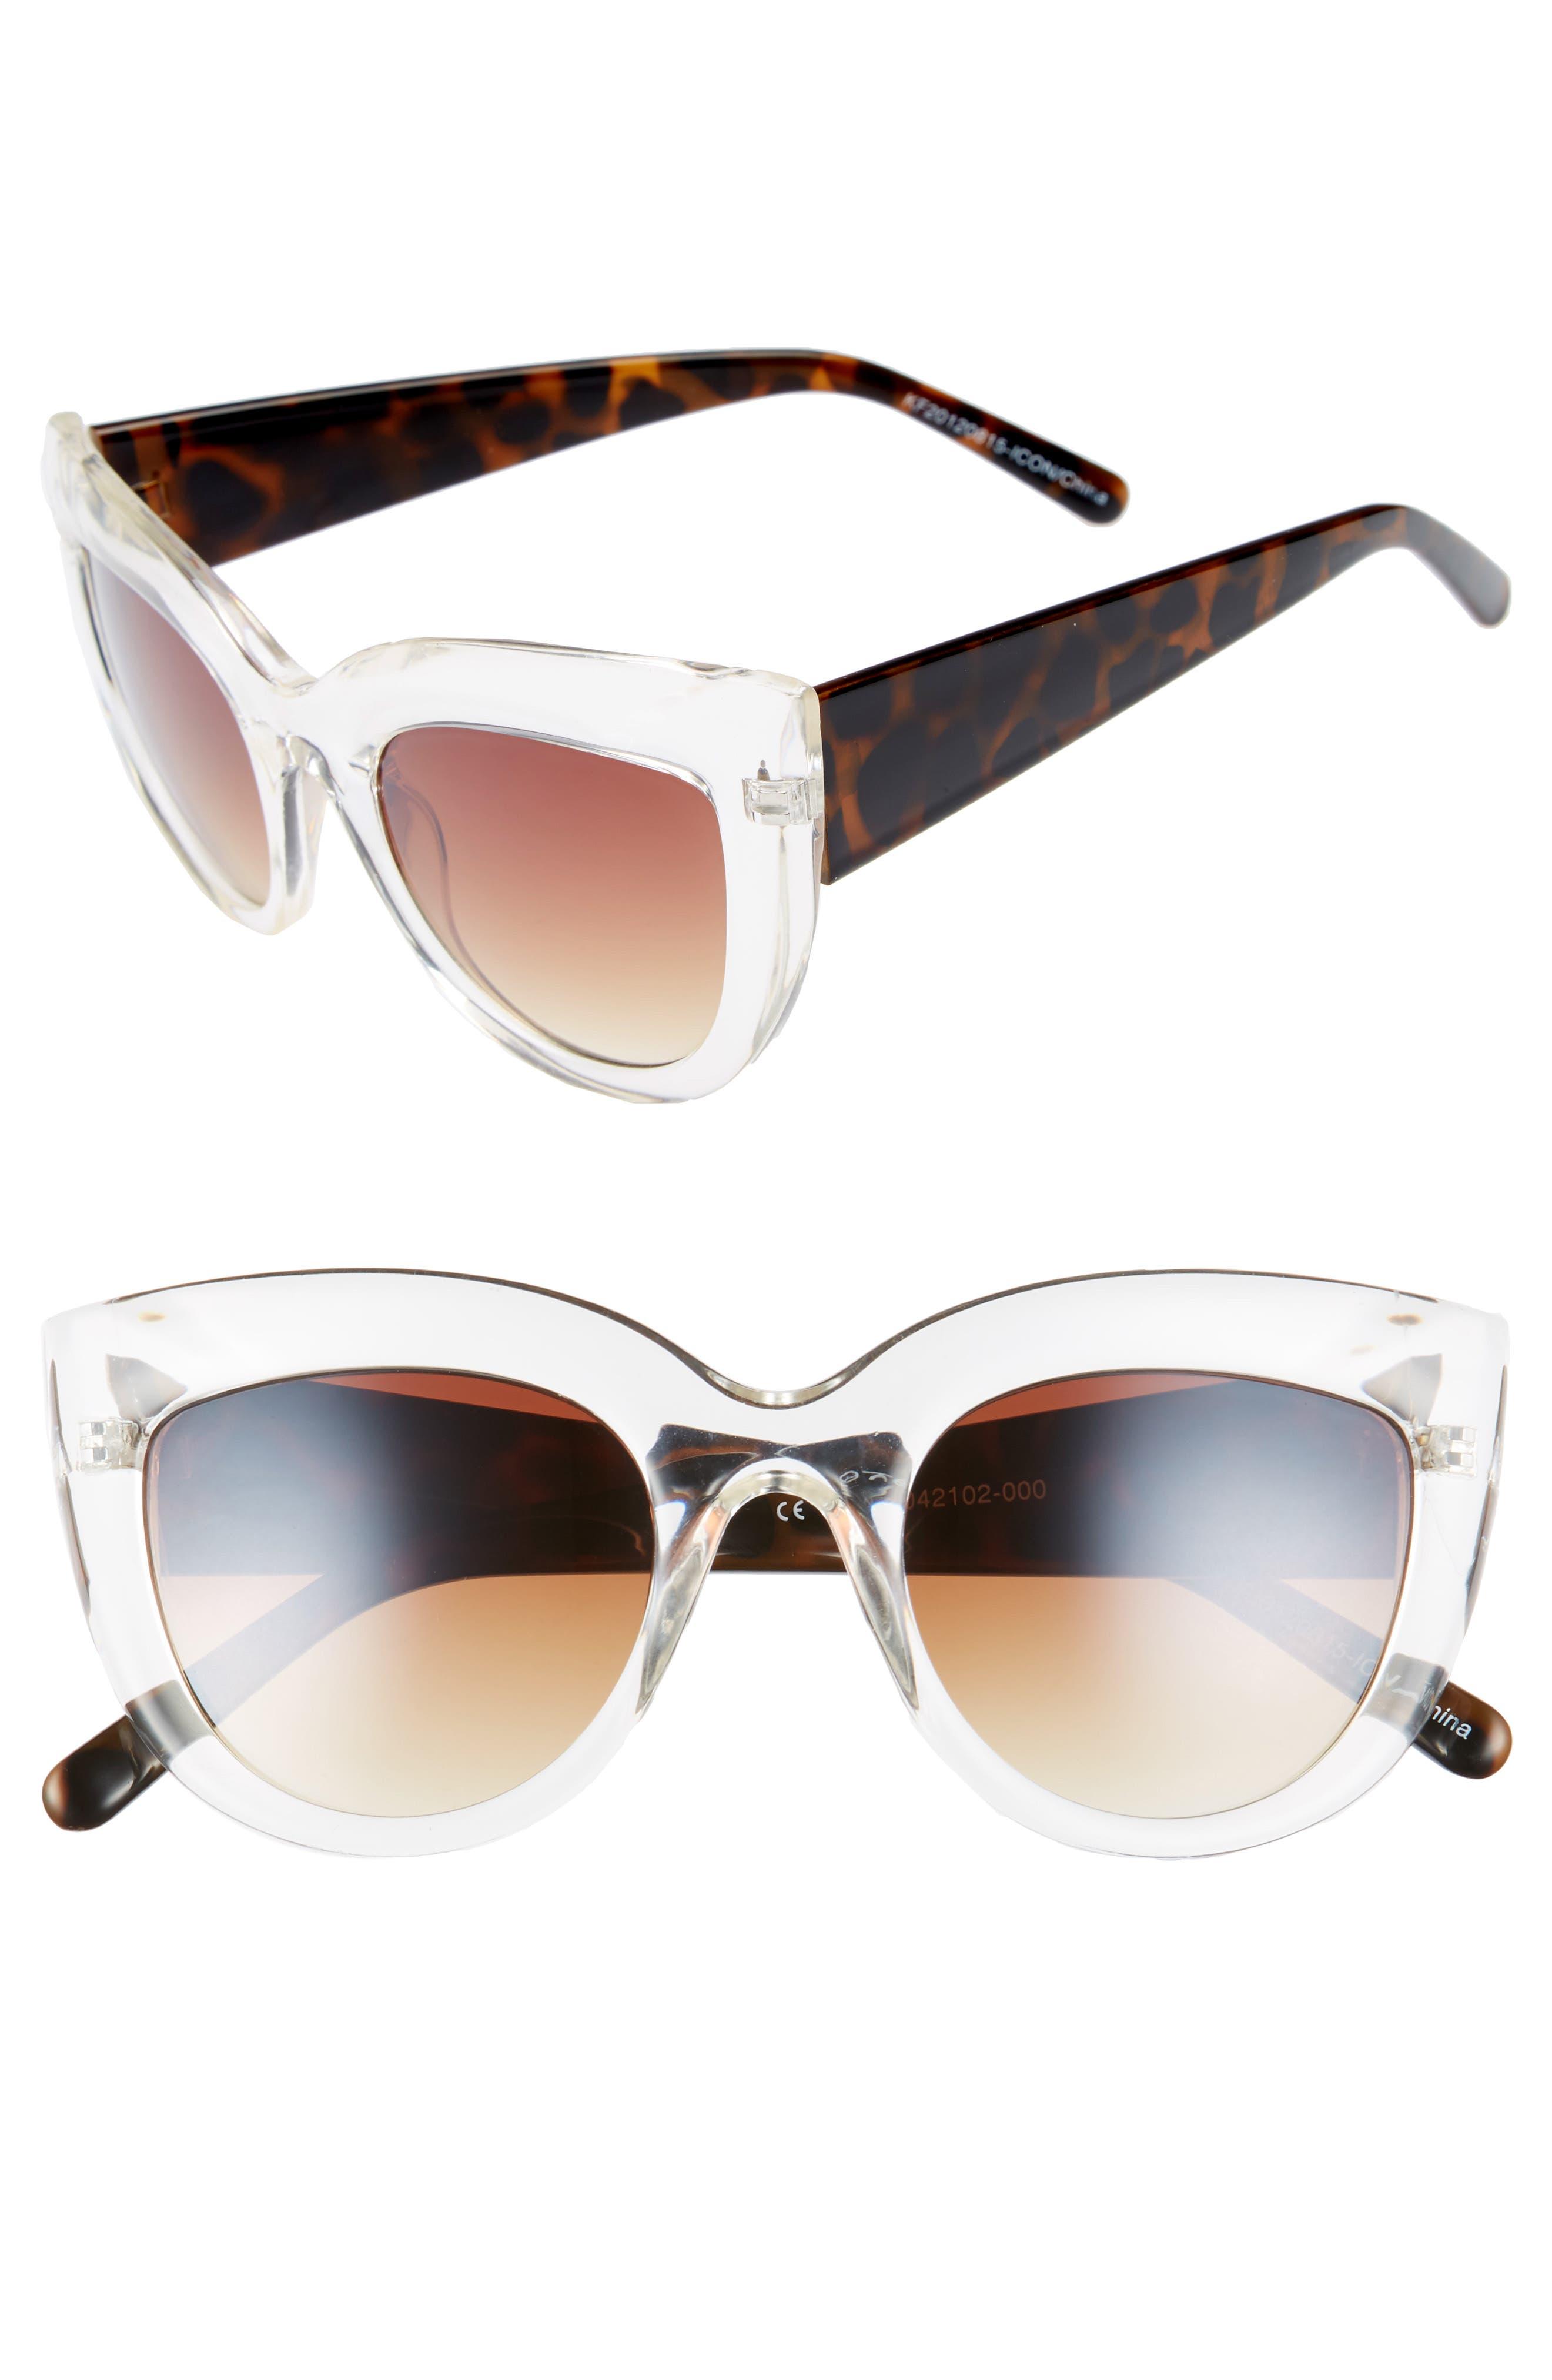 Translucent Cat Eye Sunglasses,                         Main,                         color, Tort/ Clear